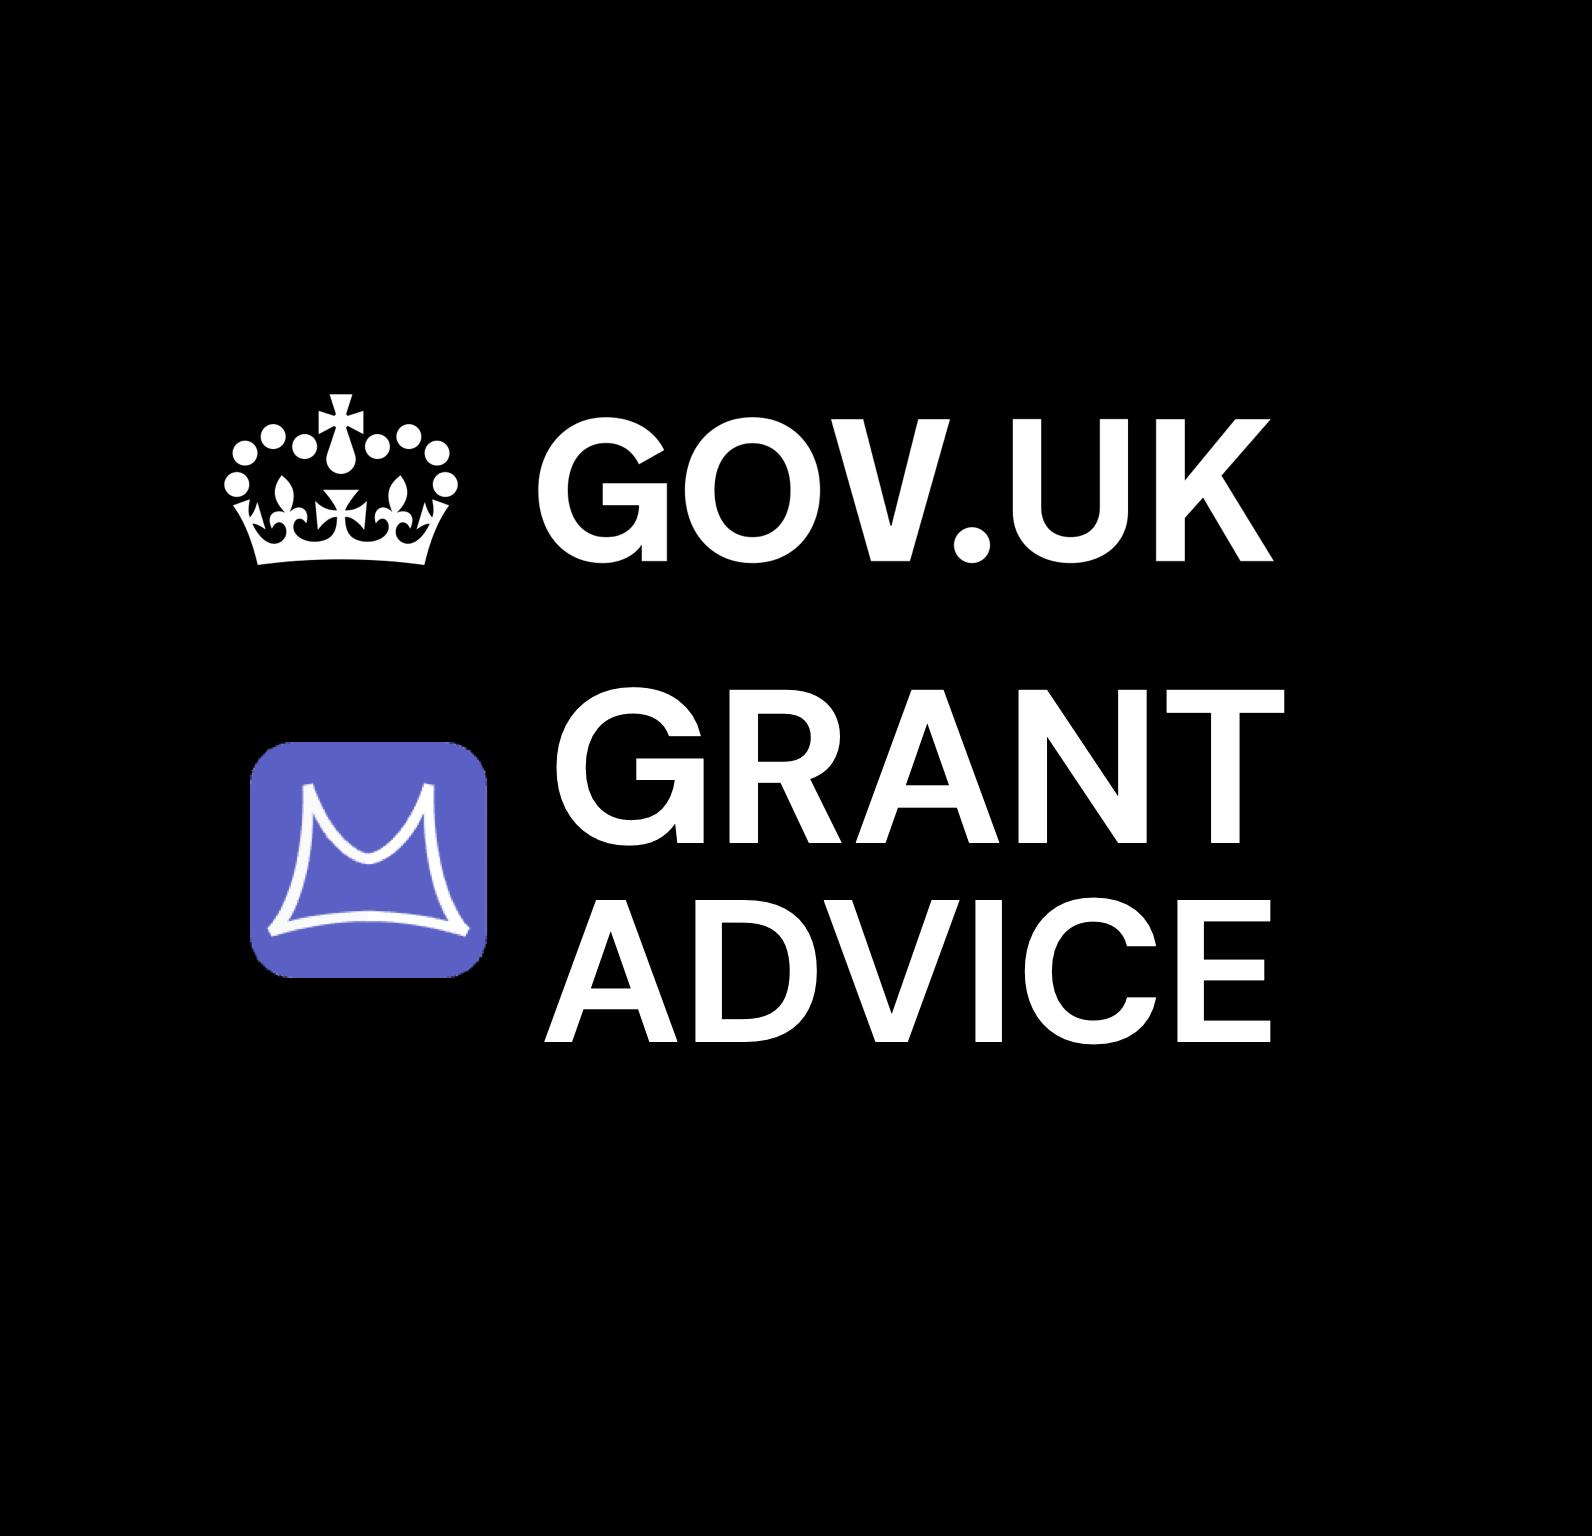 UK Open Covid Grant Funding (Jan 2021)